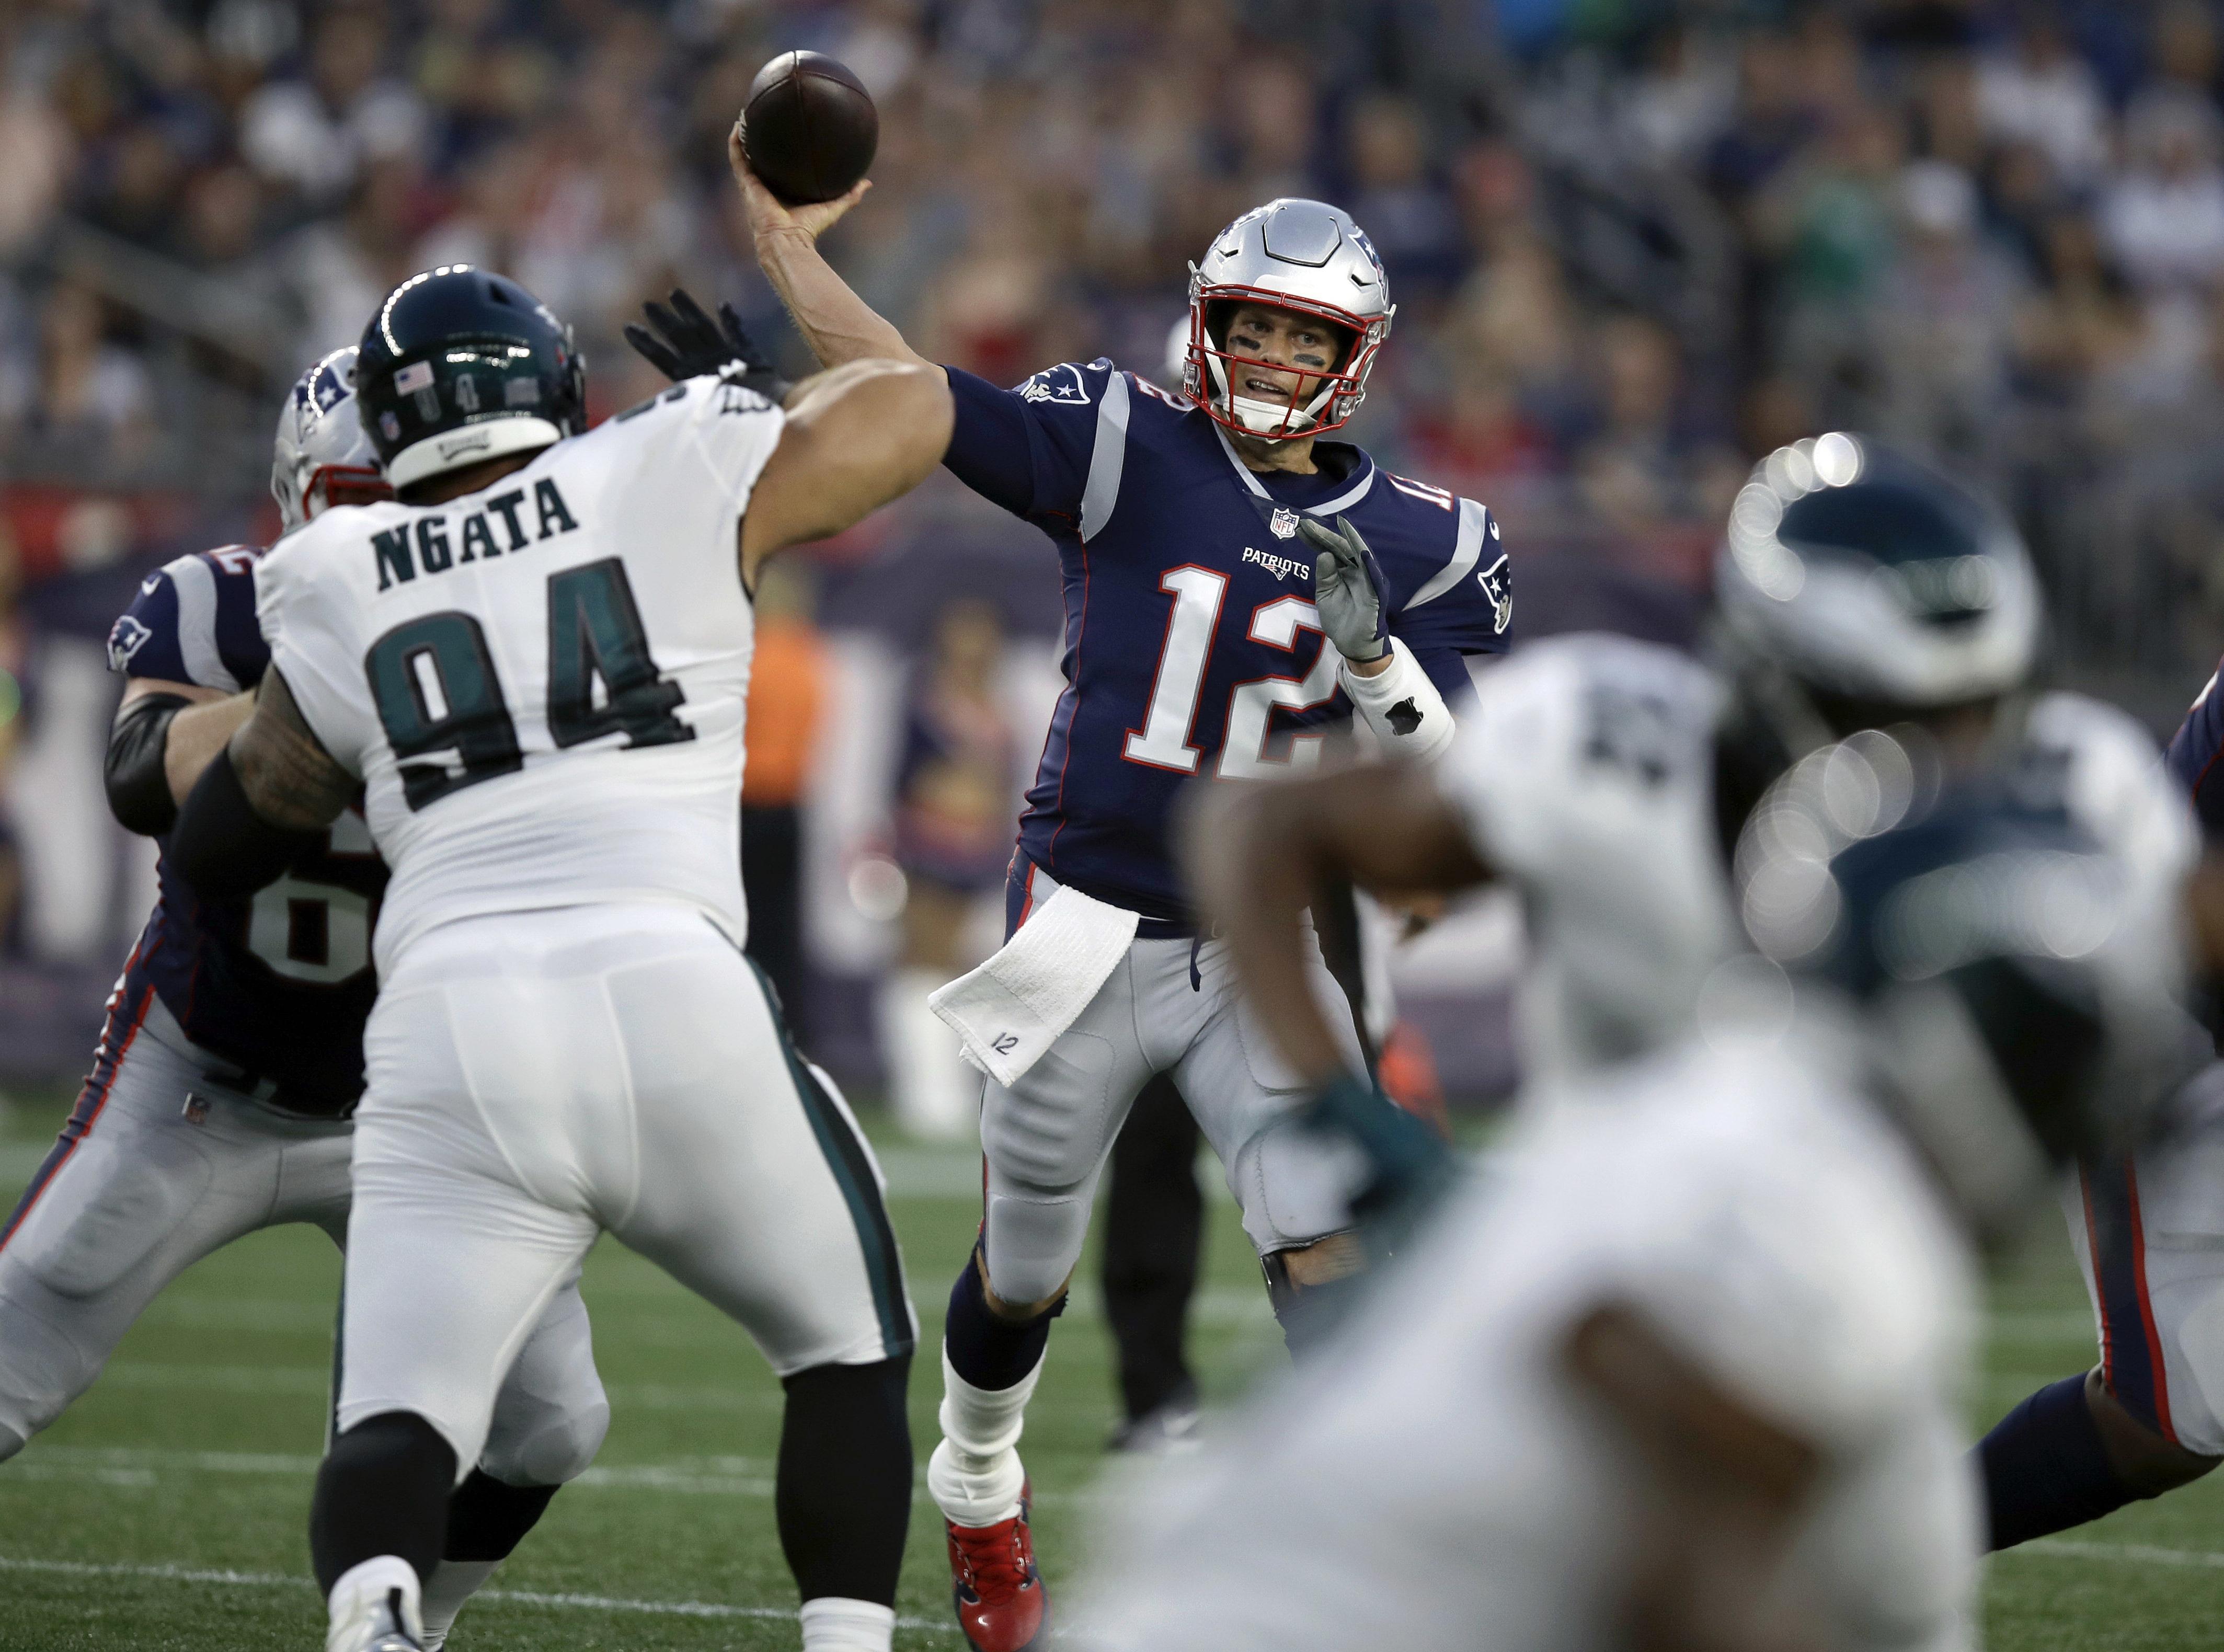 df07268fb2f New England Patriots quarterback Tom Brady (12) throws a pass under  pressure from Philadelphia